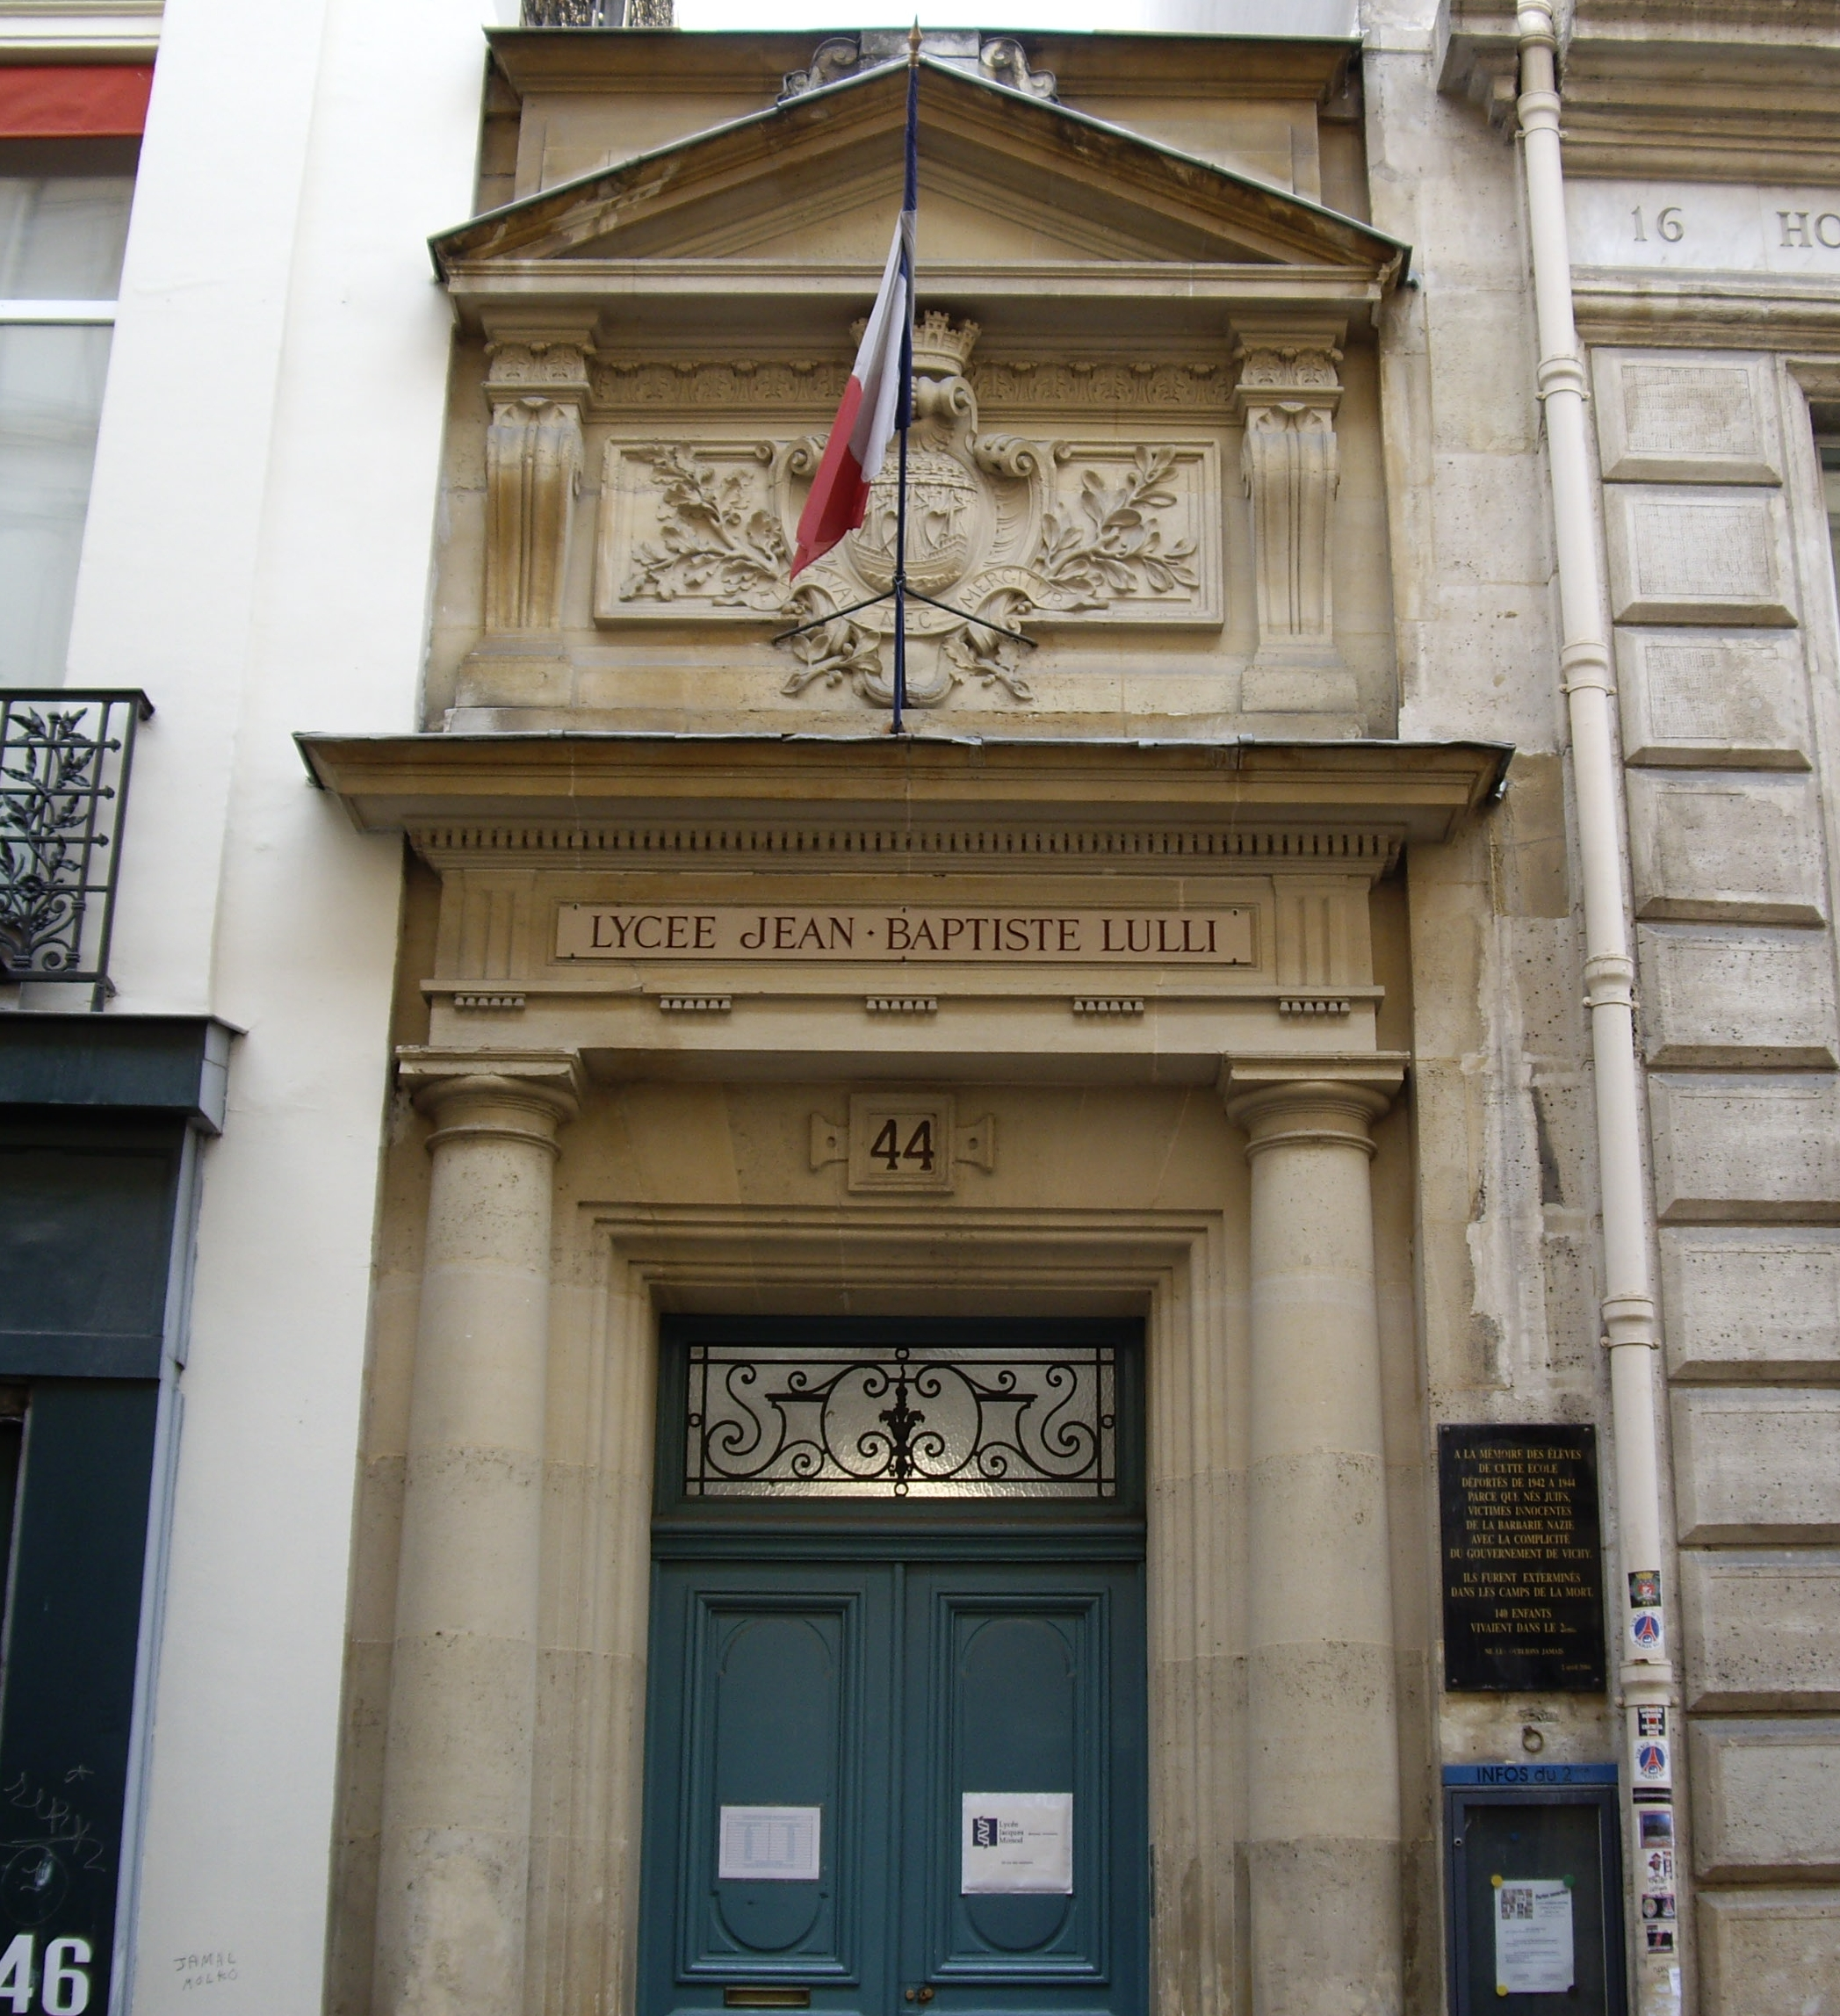 file lyc u00e9e jean-baptiste lully  rue des je u00fbneurs  paris 2 jpg